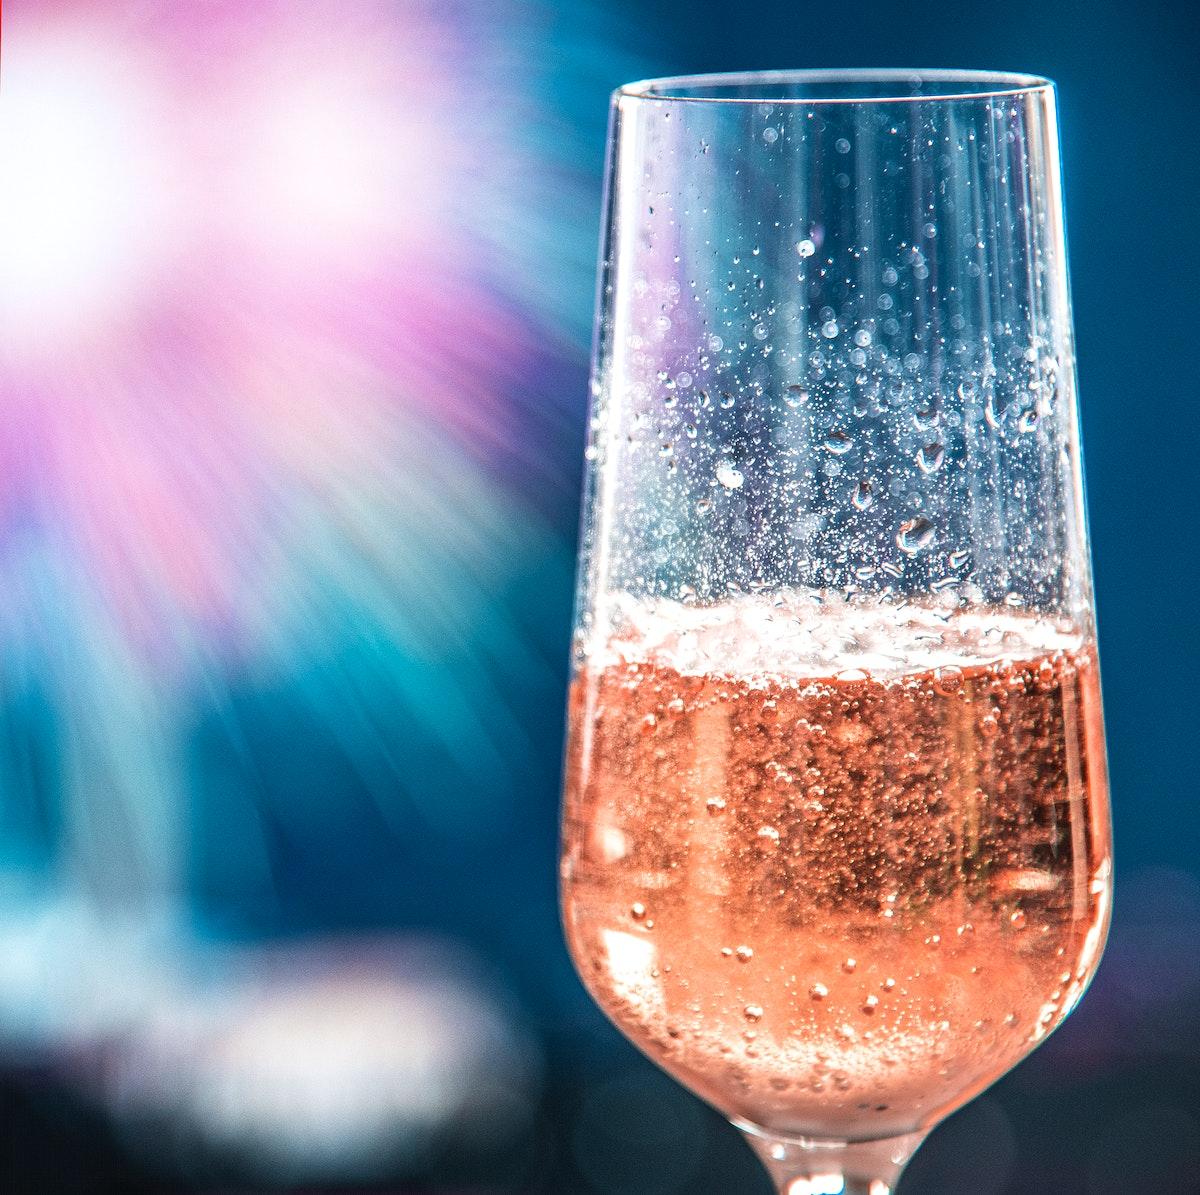 Glass of rose sparkling wine